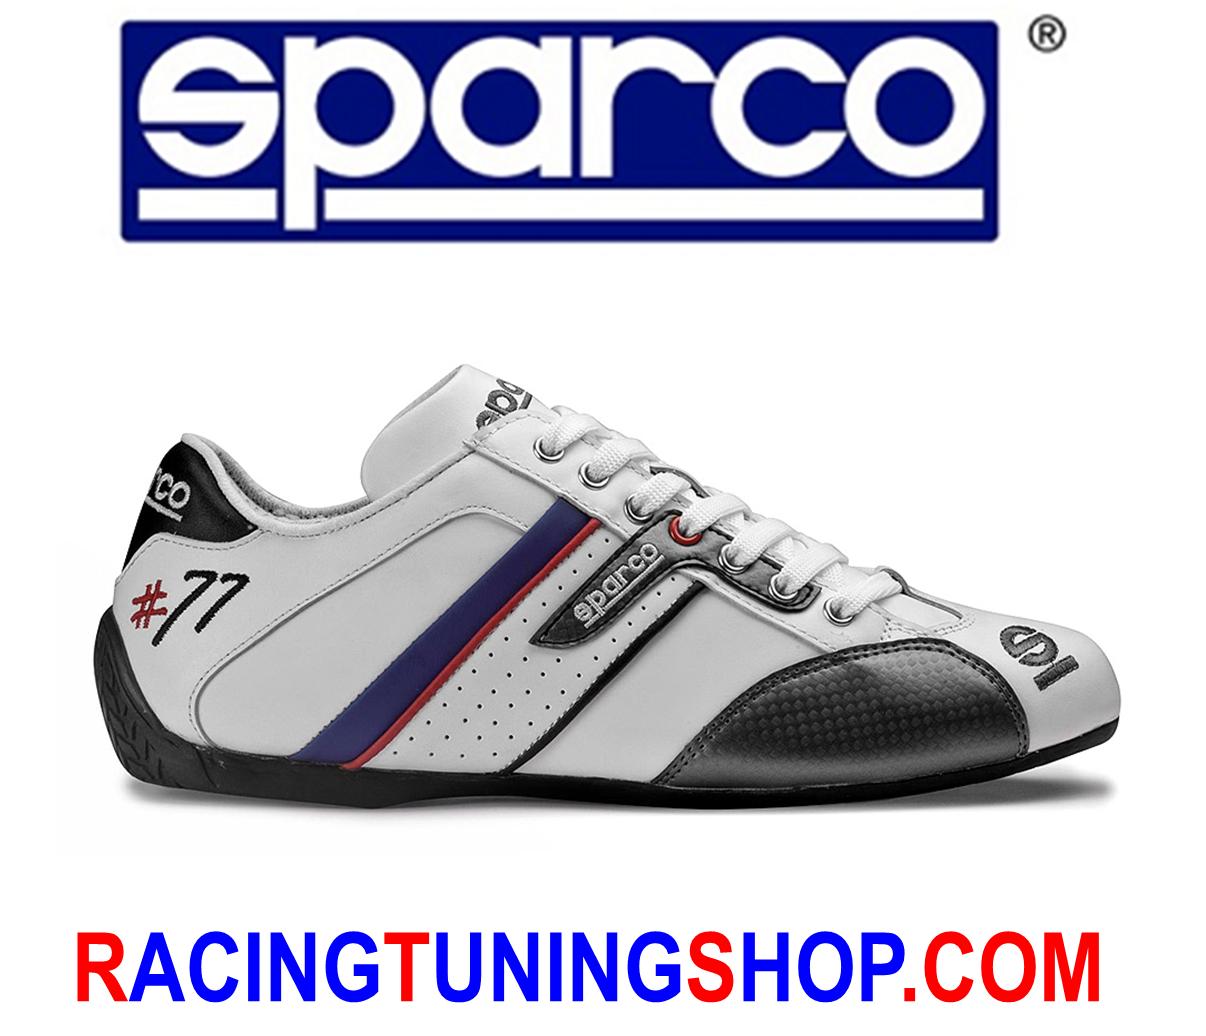 Schuhe Sparco time 77 Gr 44 weiß Turnschuhe leather Größe 44